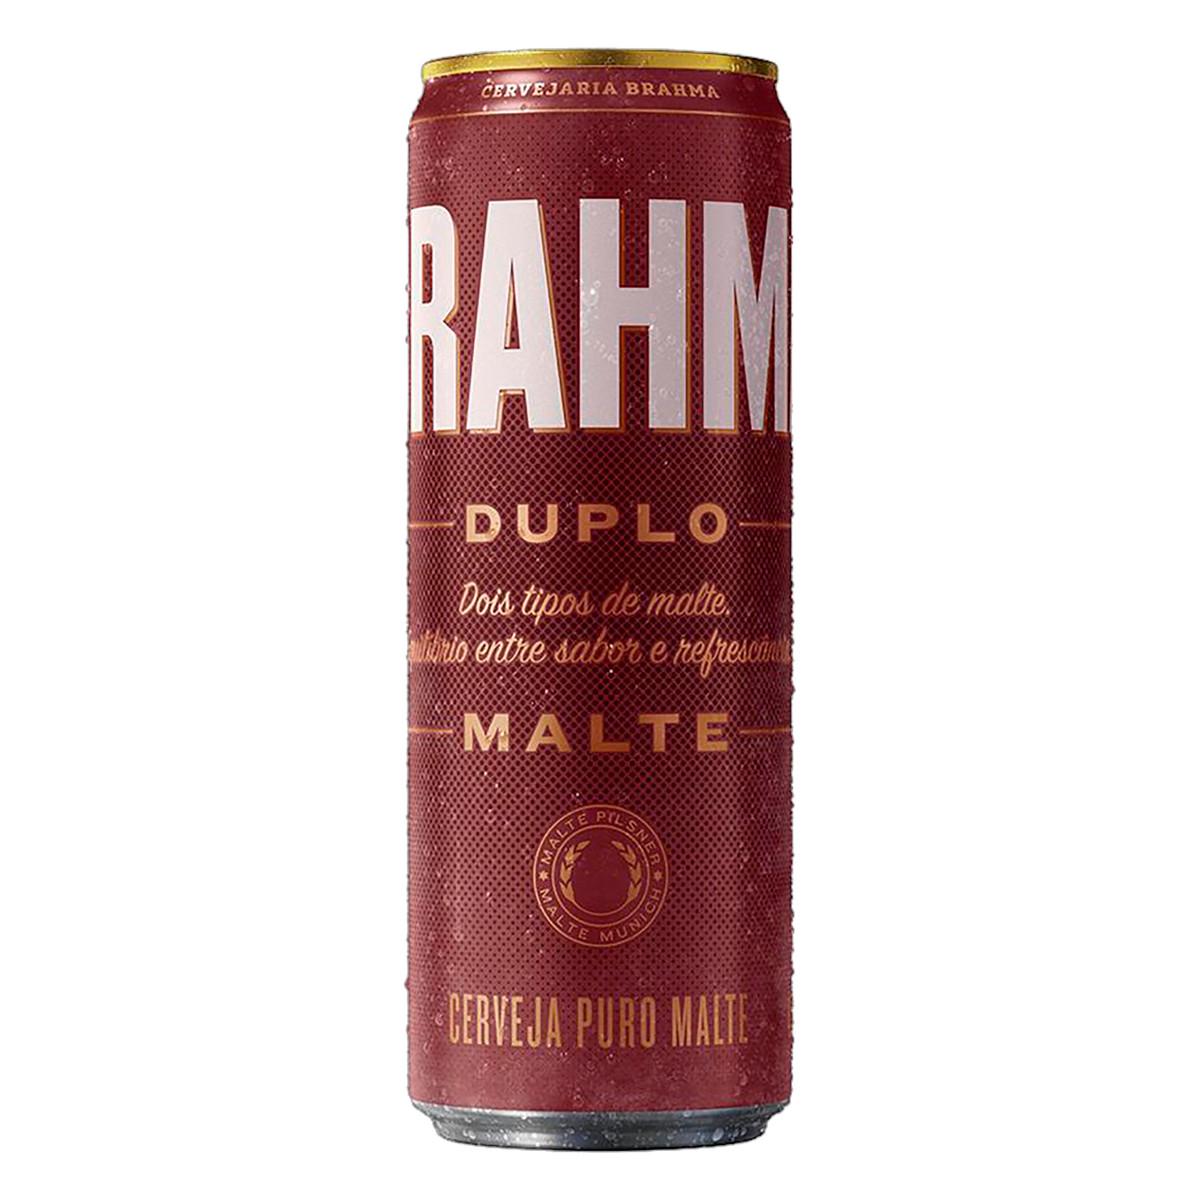 Cerveja Duplo Malte 350ml Brahma lata UN